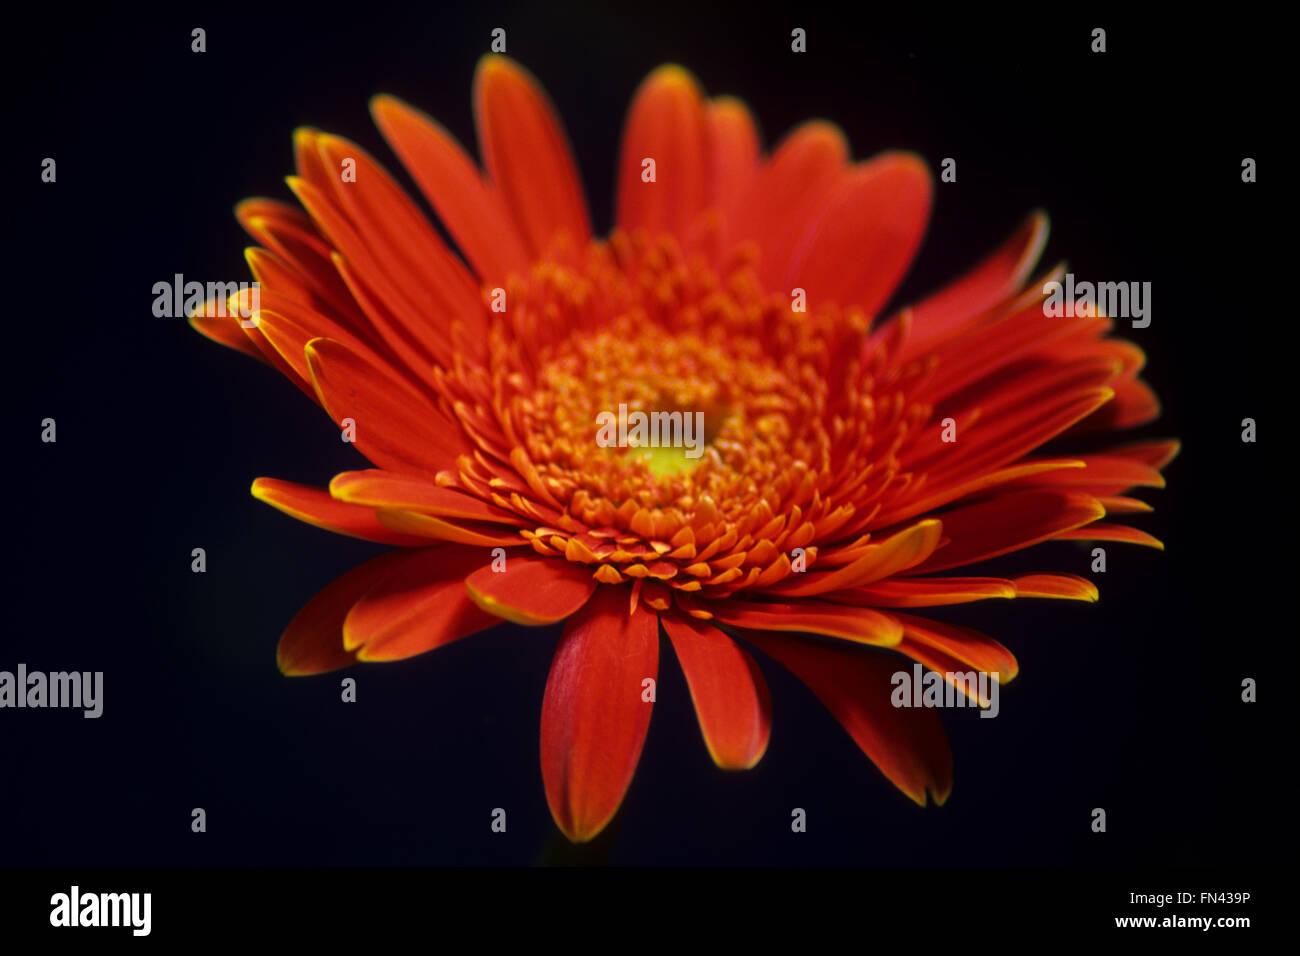 Solo orange gerbera vibrante sobre un fondo negro Imagen De Stock